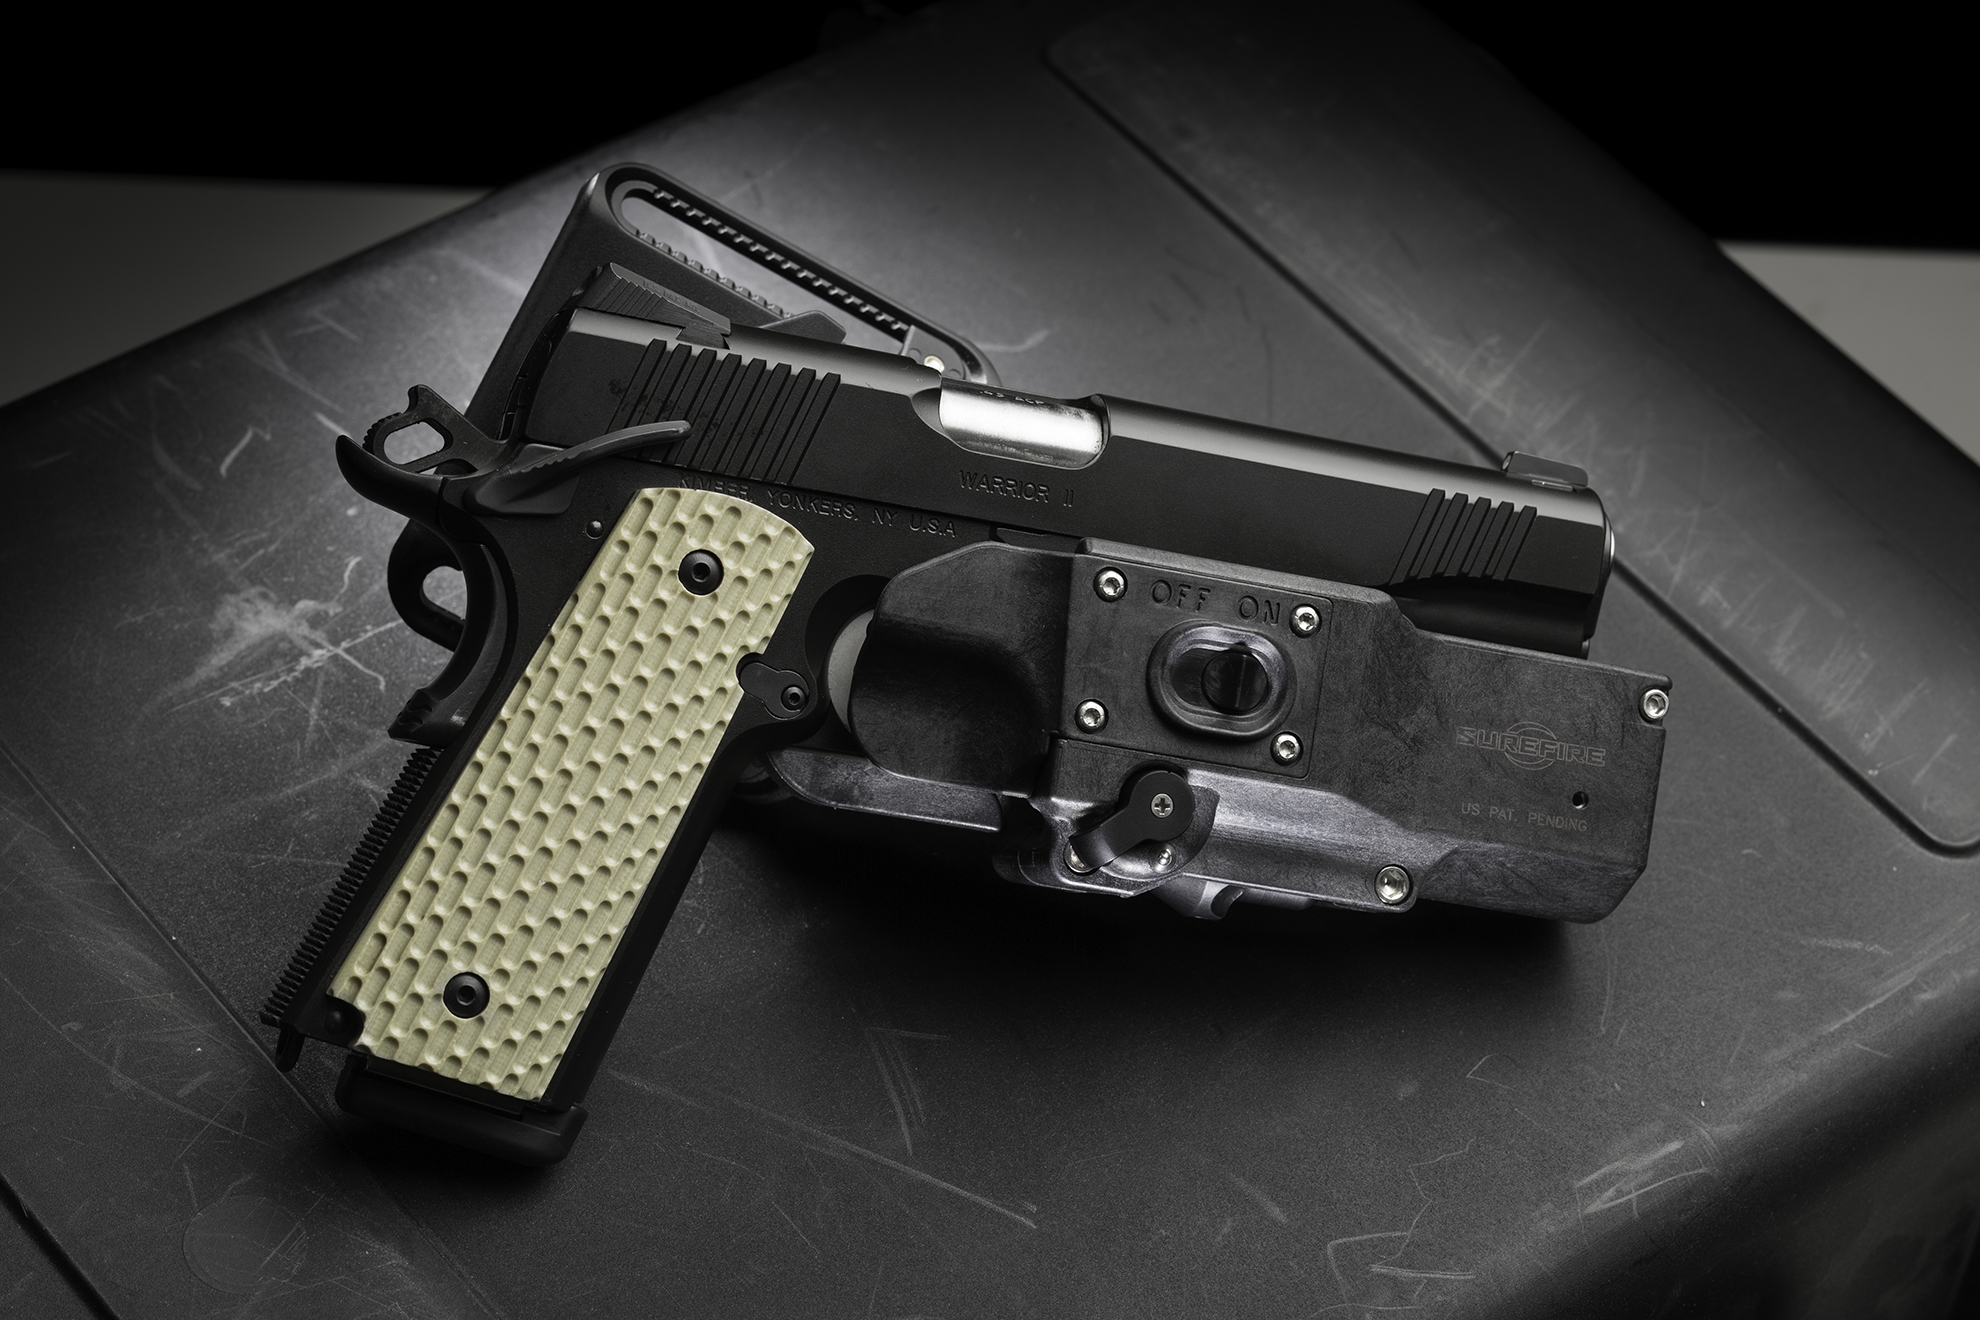 SureFire MasterFire Holster with Kimber 1911-style pistol